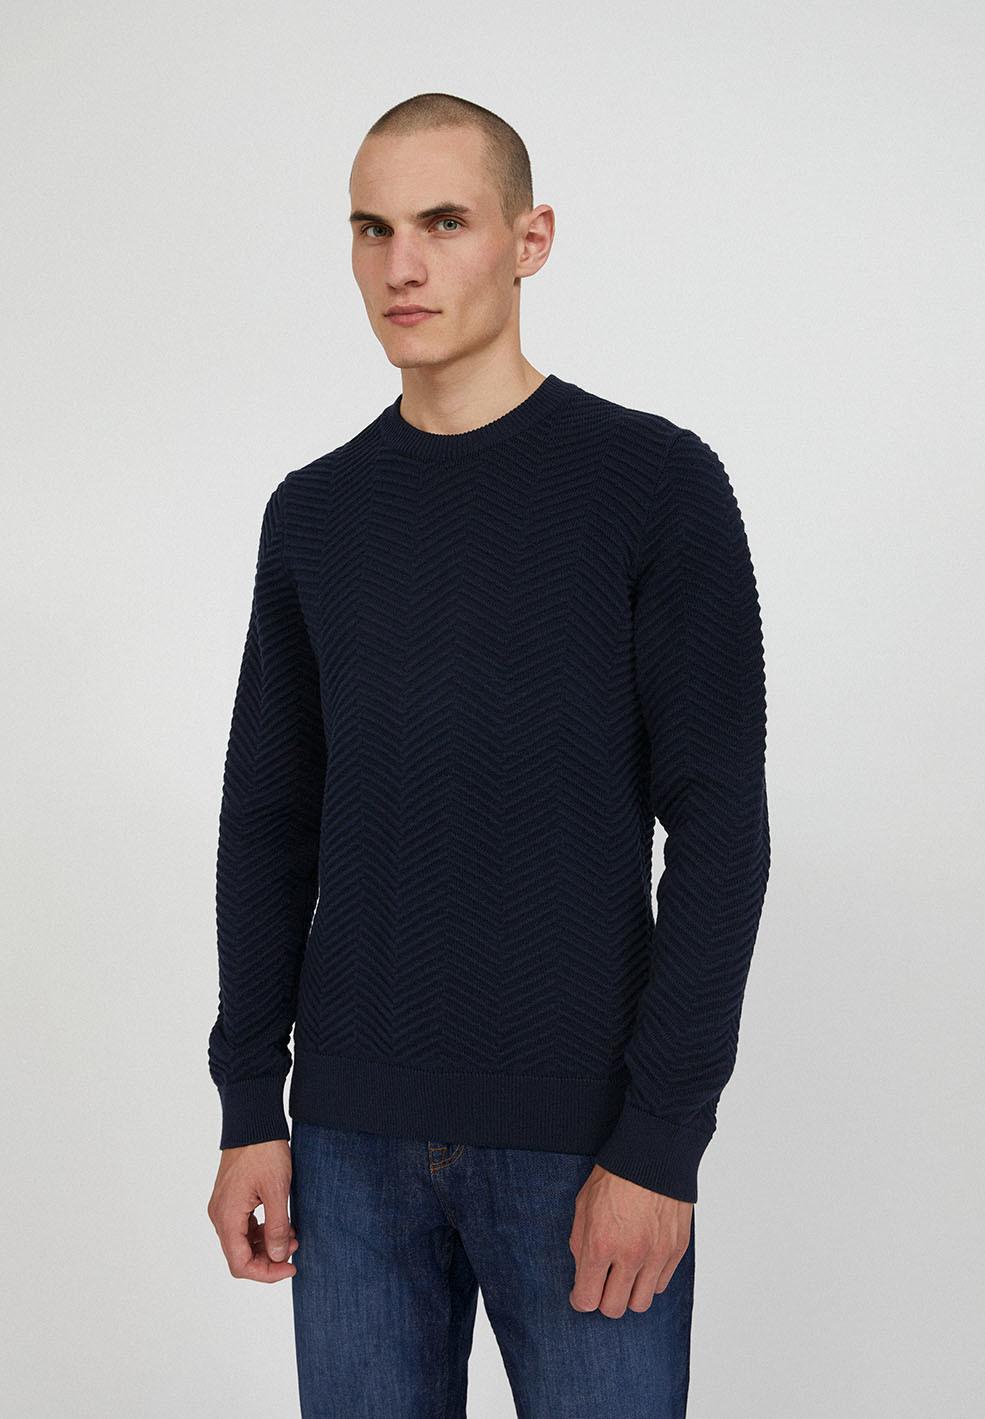 Armedangels Pullover aus Bio-Baumwolle Modell 'Heringaa' - Marineblau